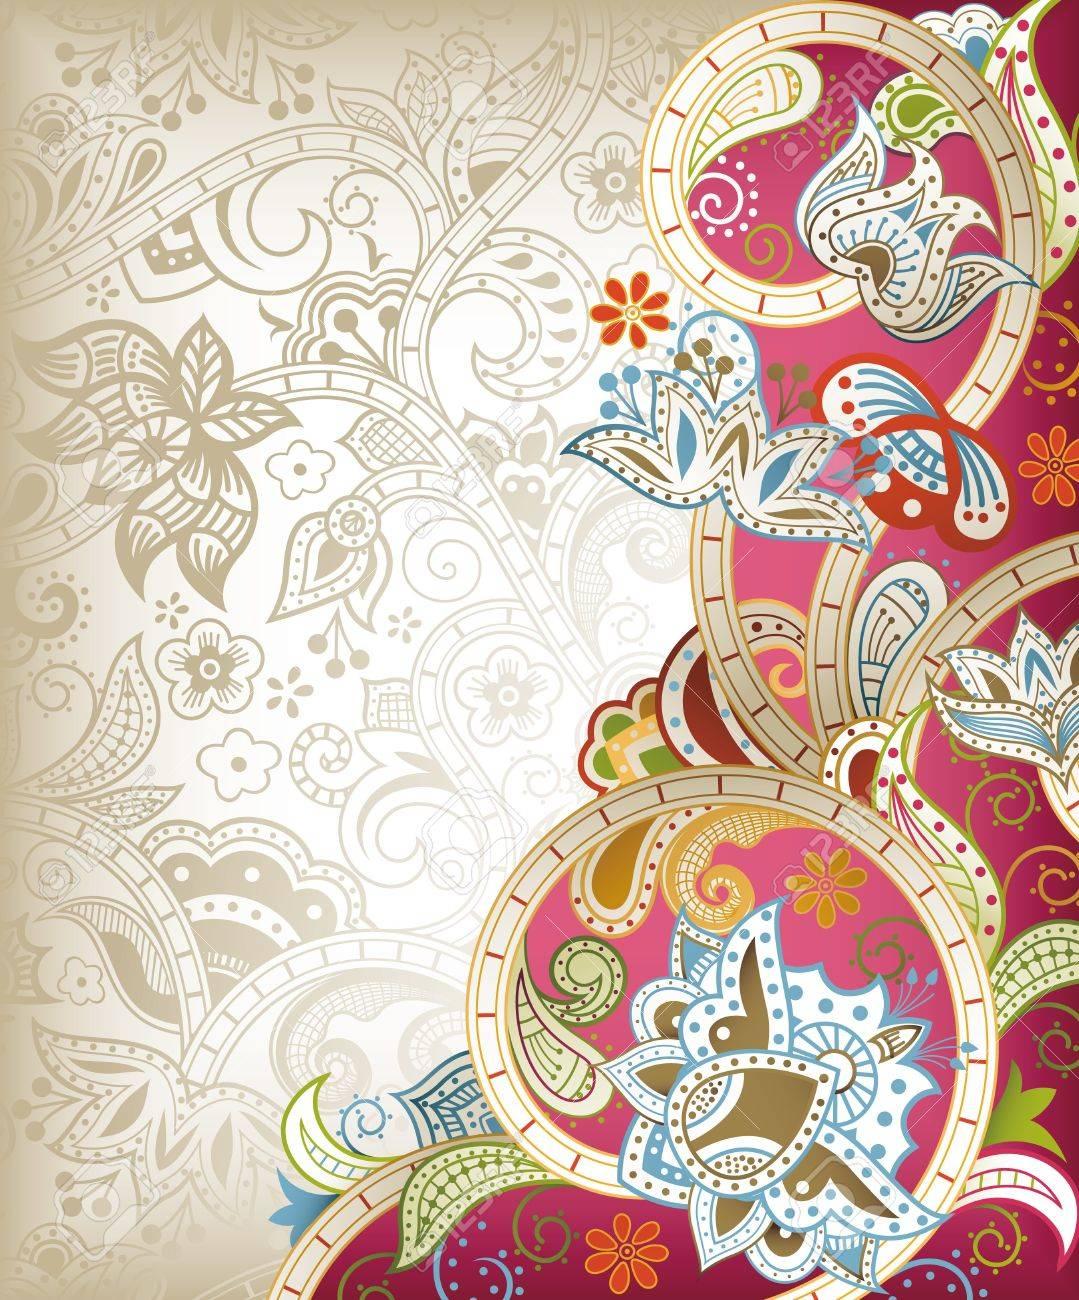 Chinese Wedding Invitation Card Royalty Free Cliparts, Vectors ...